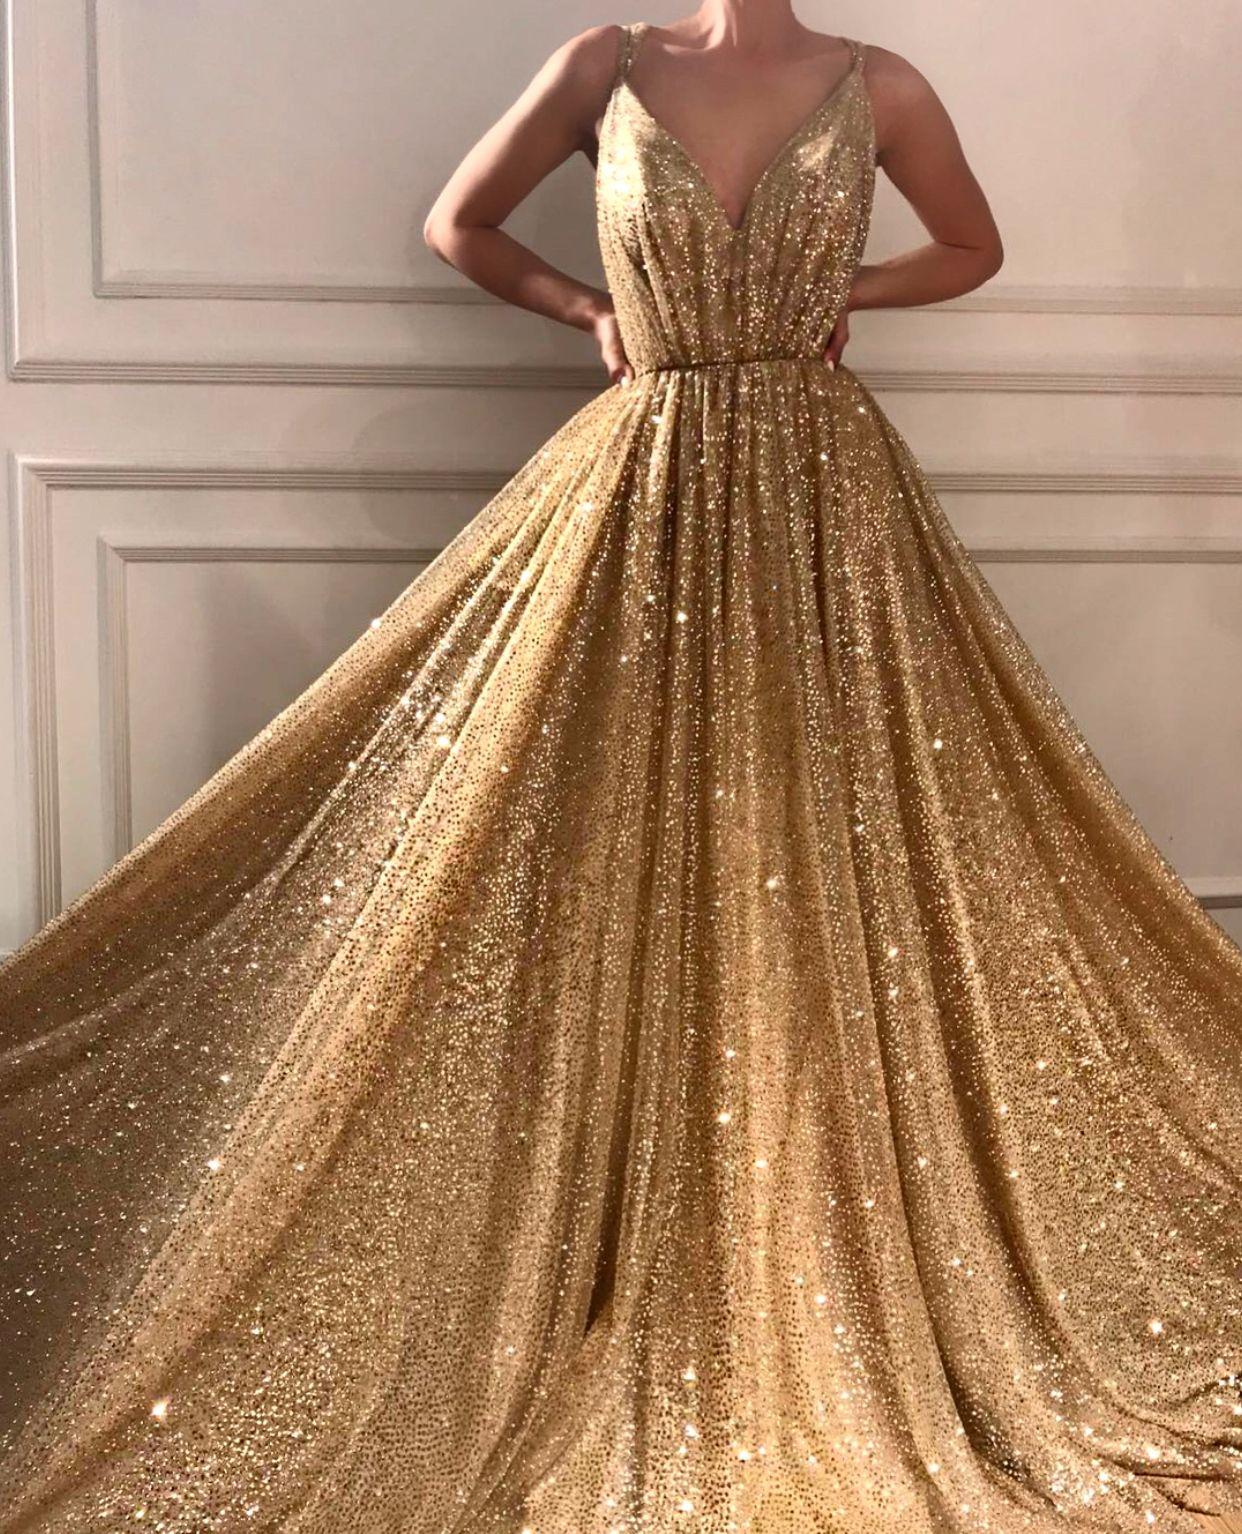 Dresses Af Dresses Og Kjoler Matilde Prom Pin Pinterest På 0qgwCfz